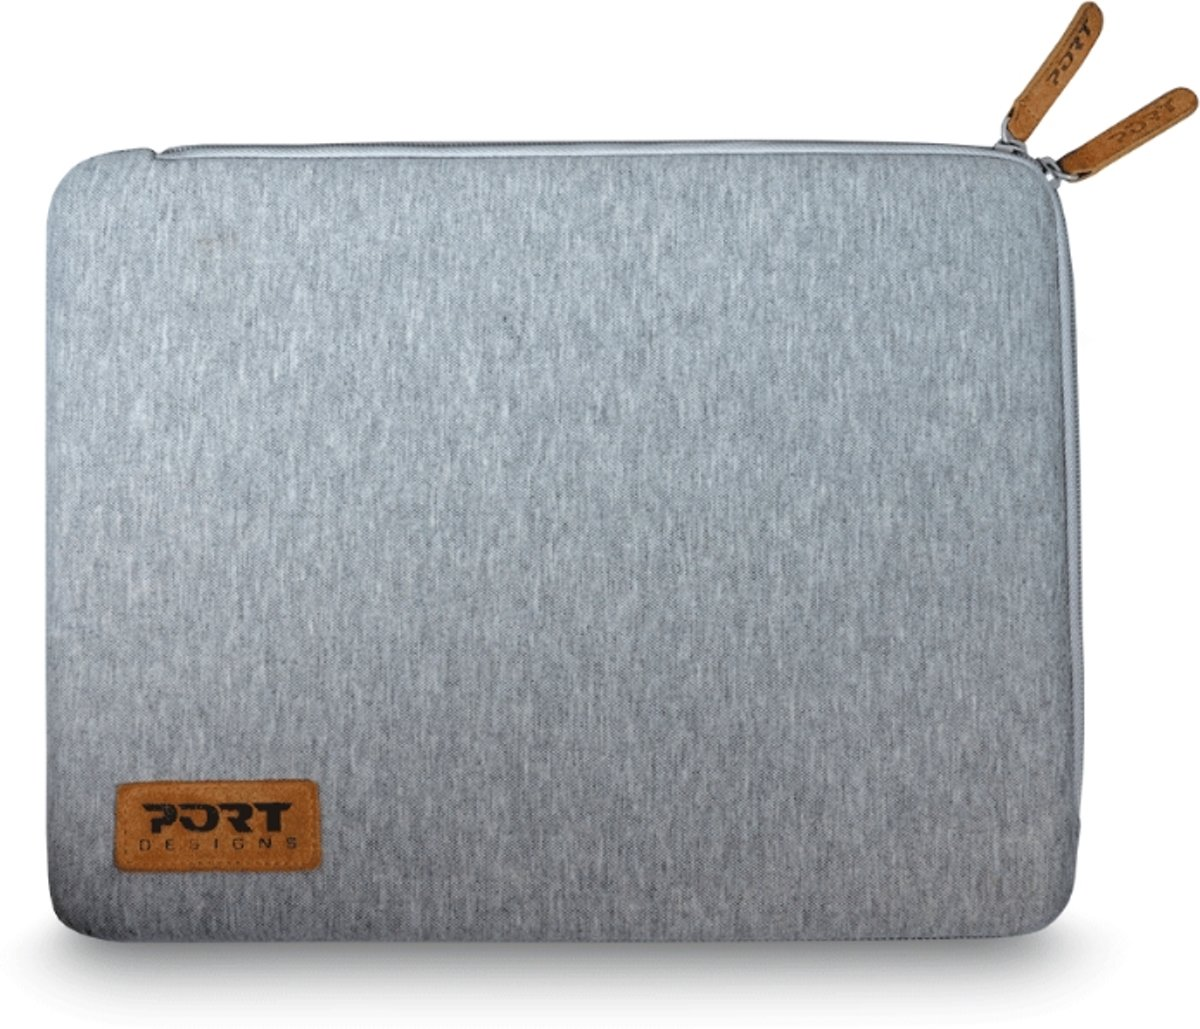 "PORT Designs TORINO 10/12.5"""